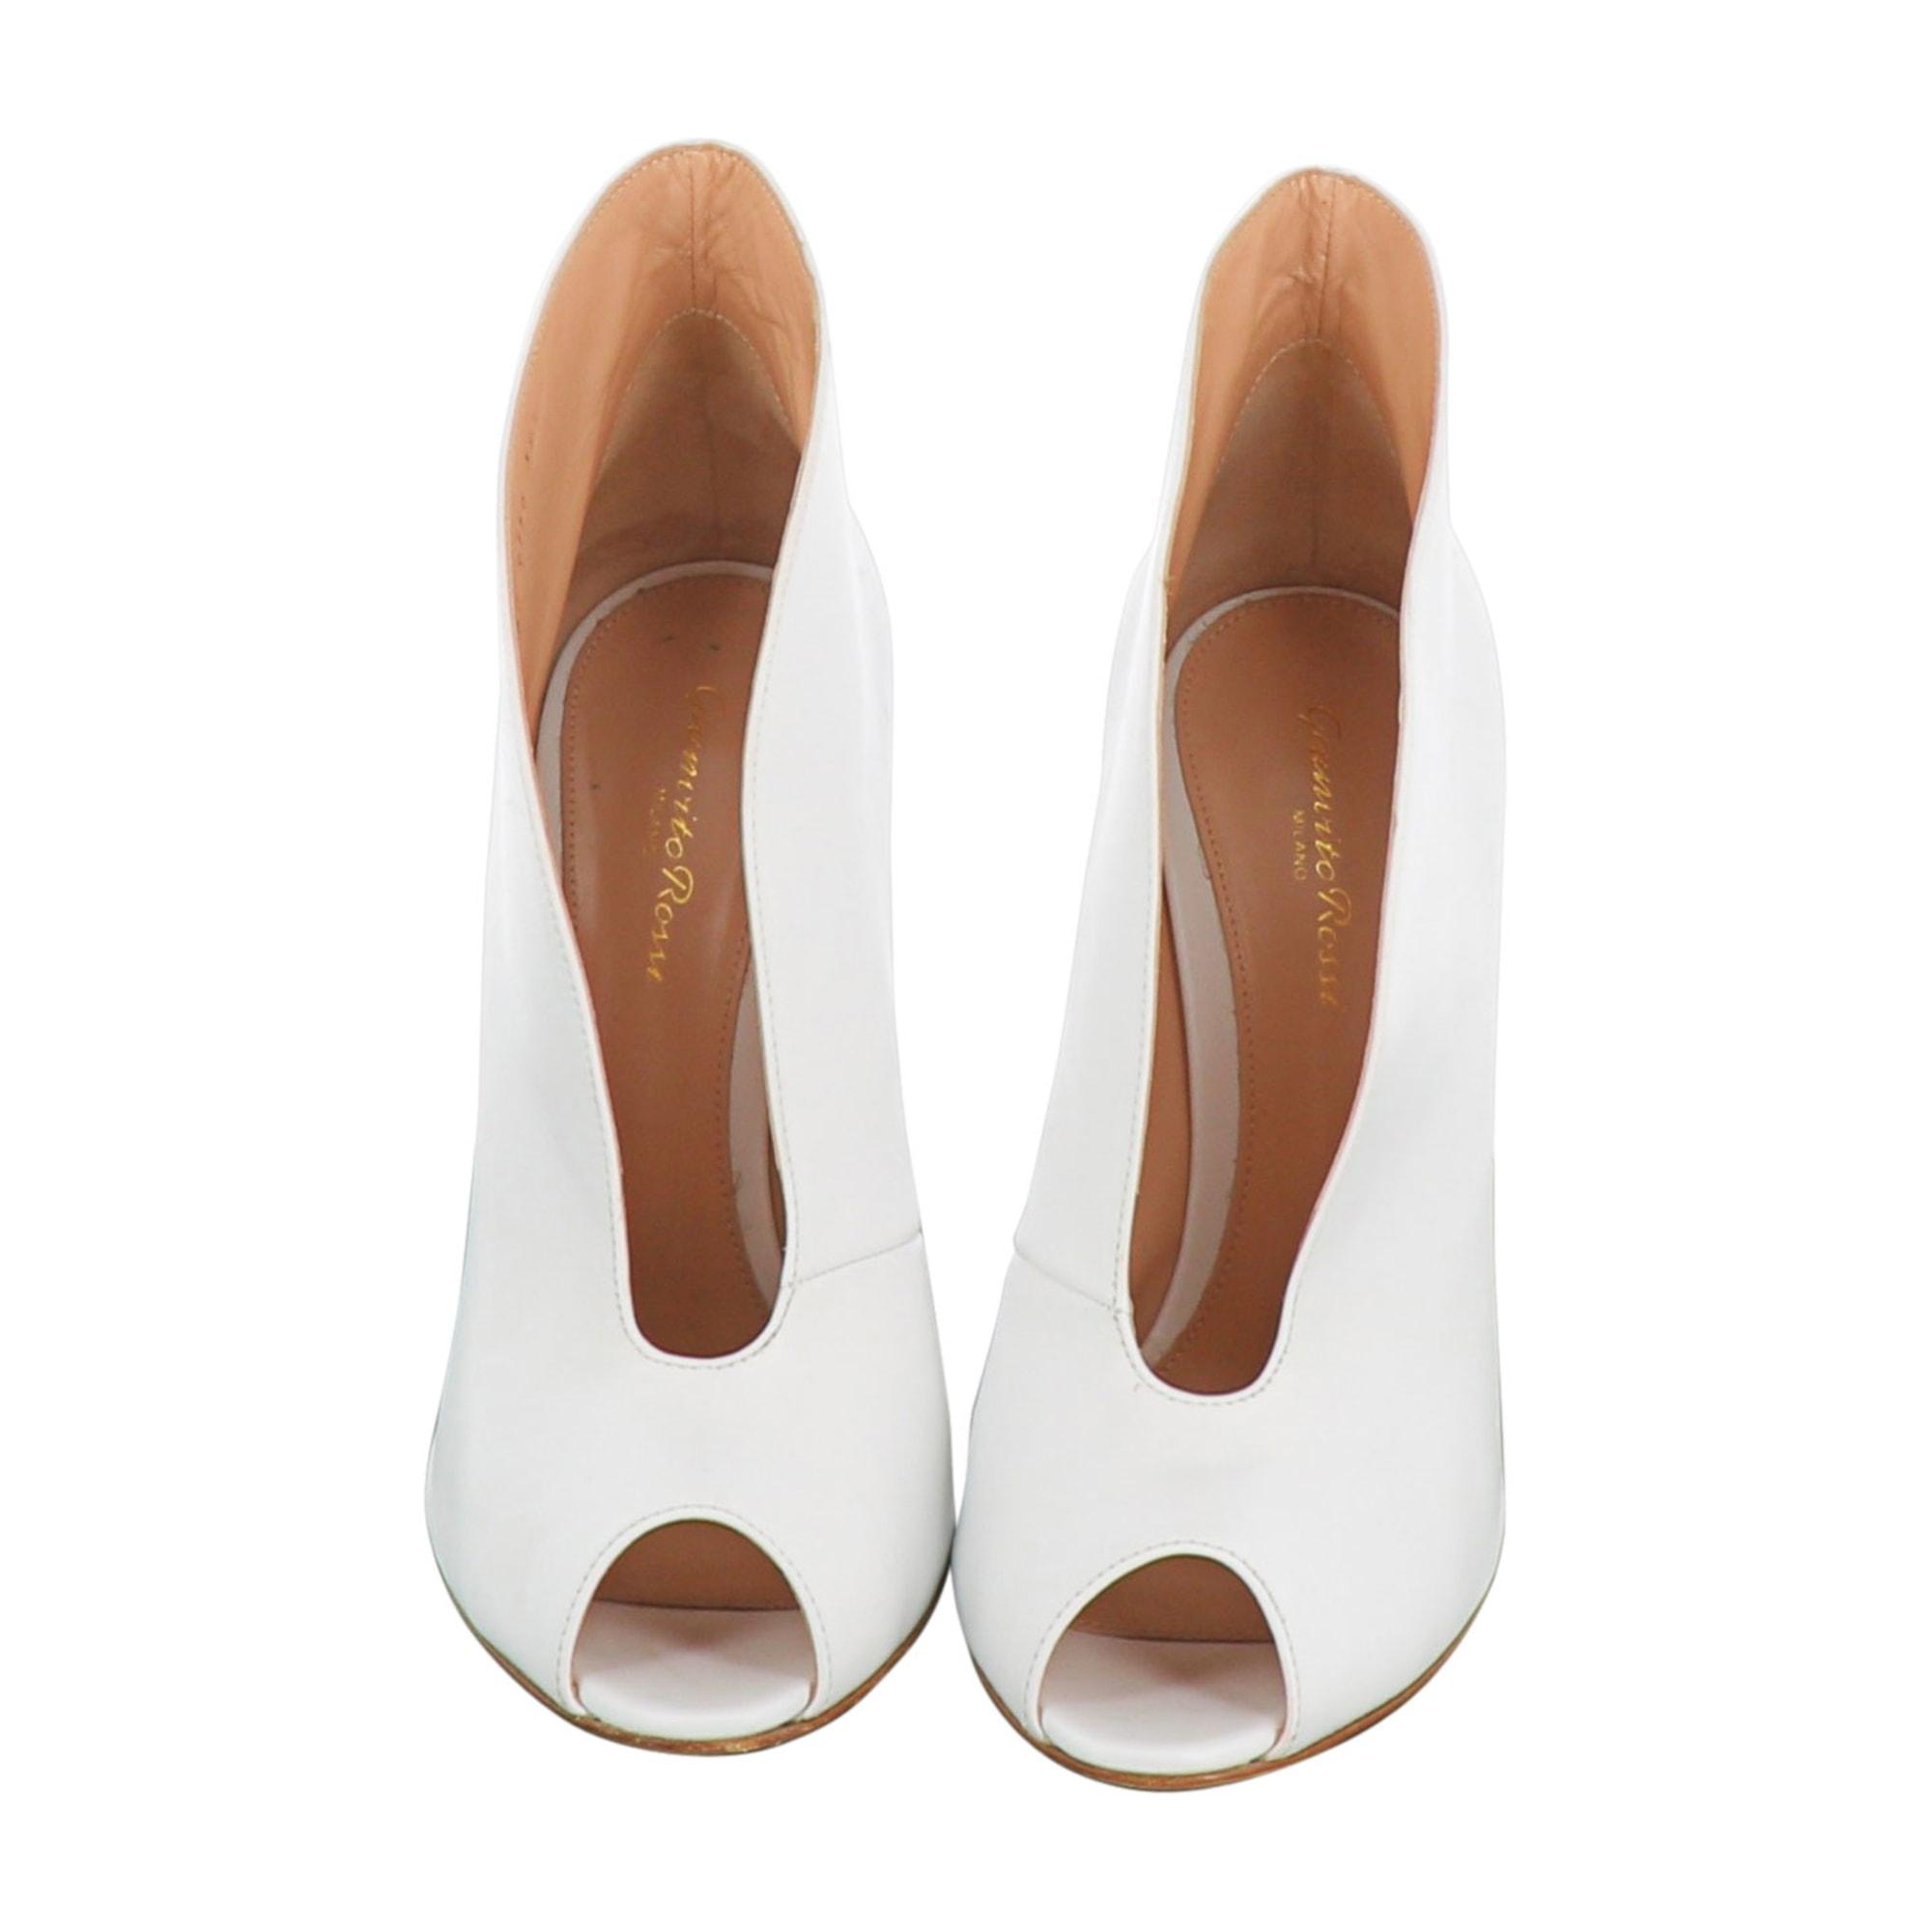 Bottines & low boots à talons GIANVITO ROSSI Blanc, blanc cassé, écru